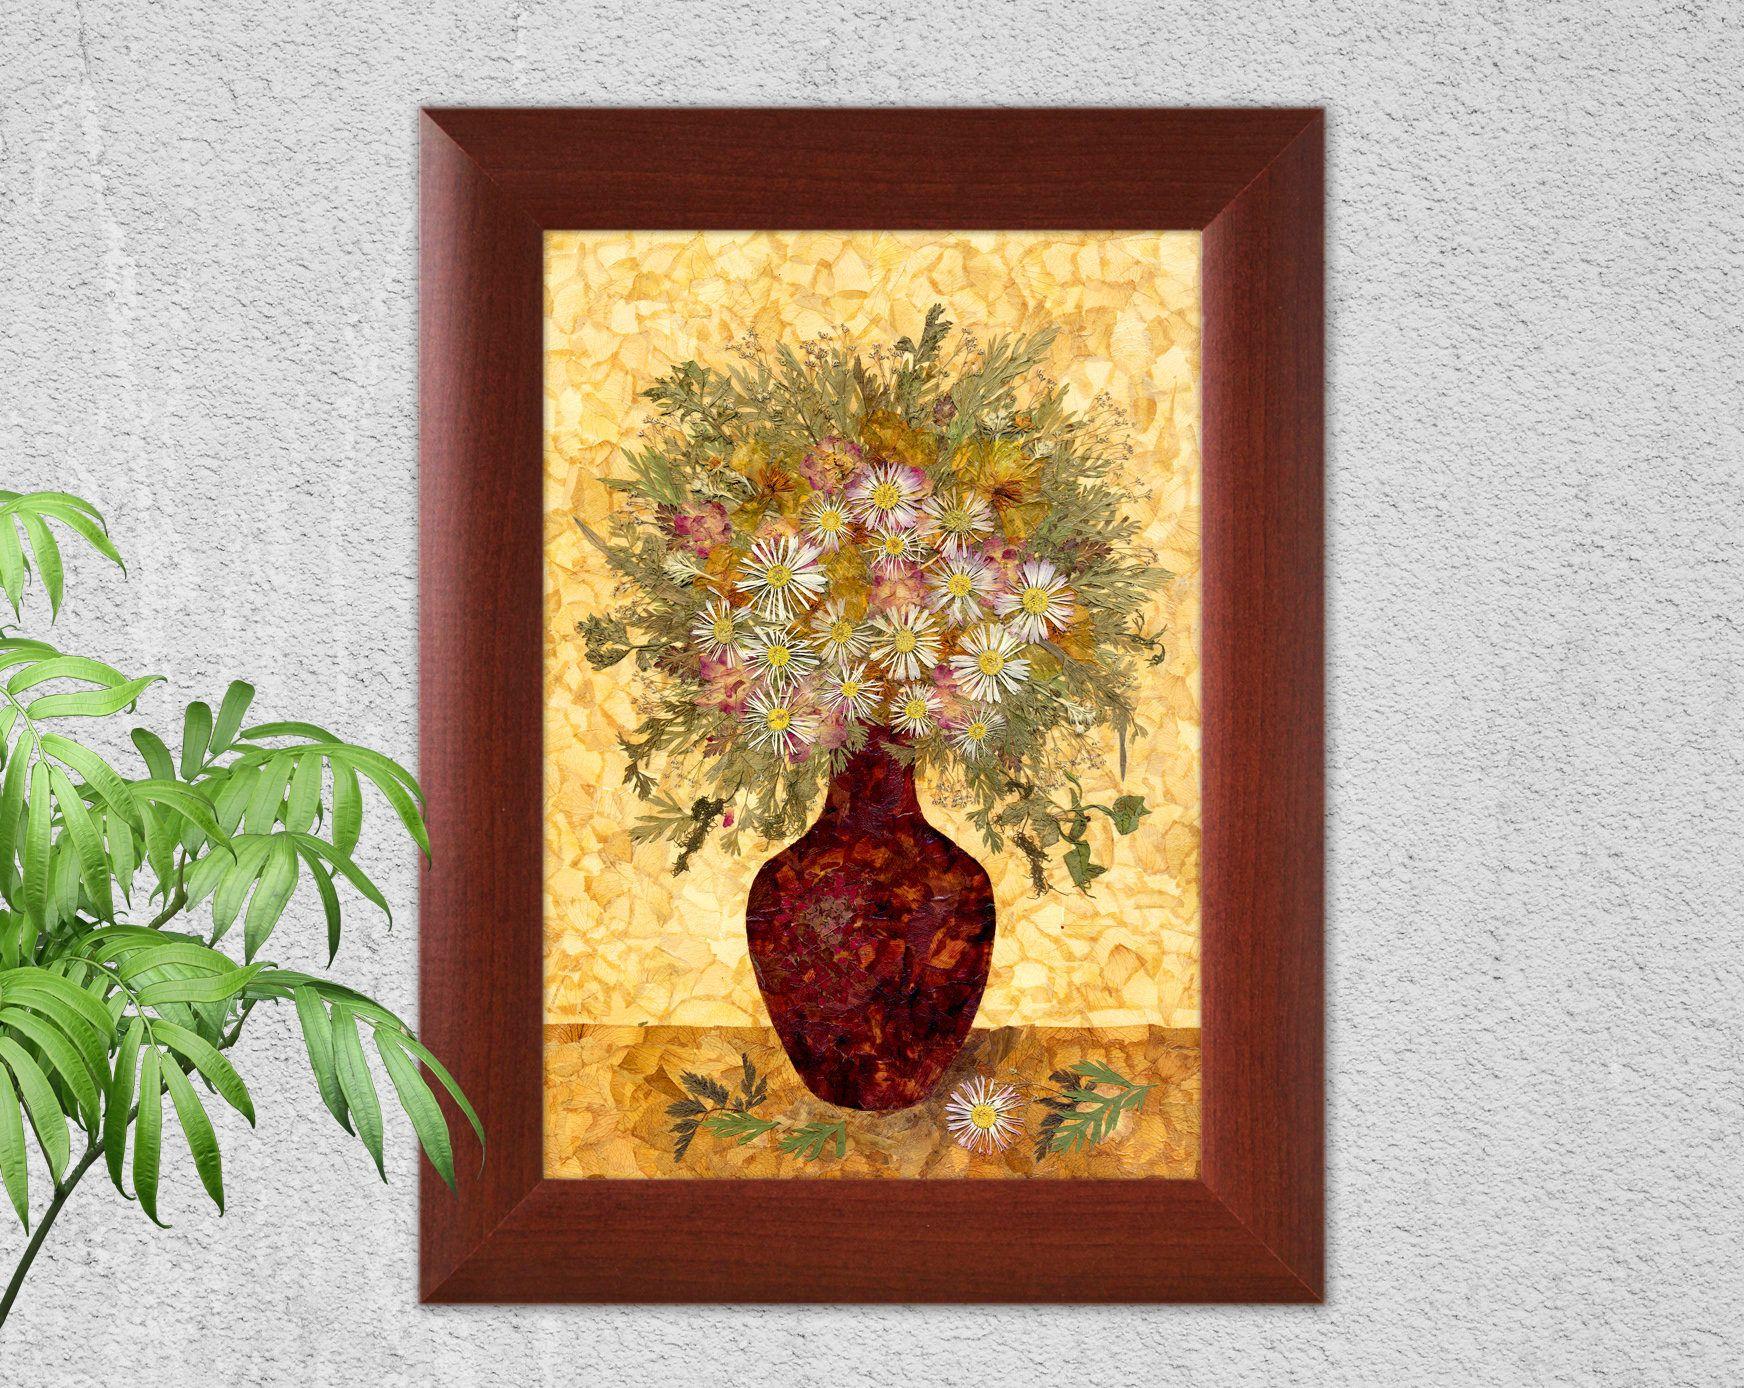 Flower still-lifes, pressed flowers, pressed leaves, rose petals ...